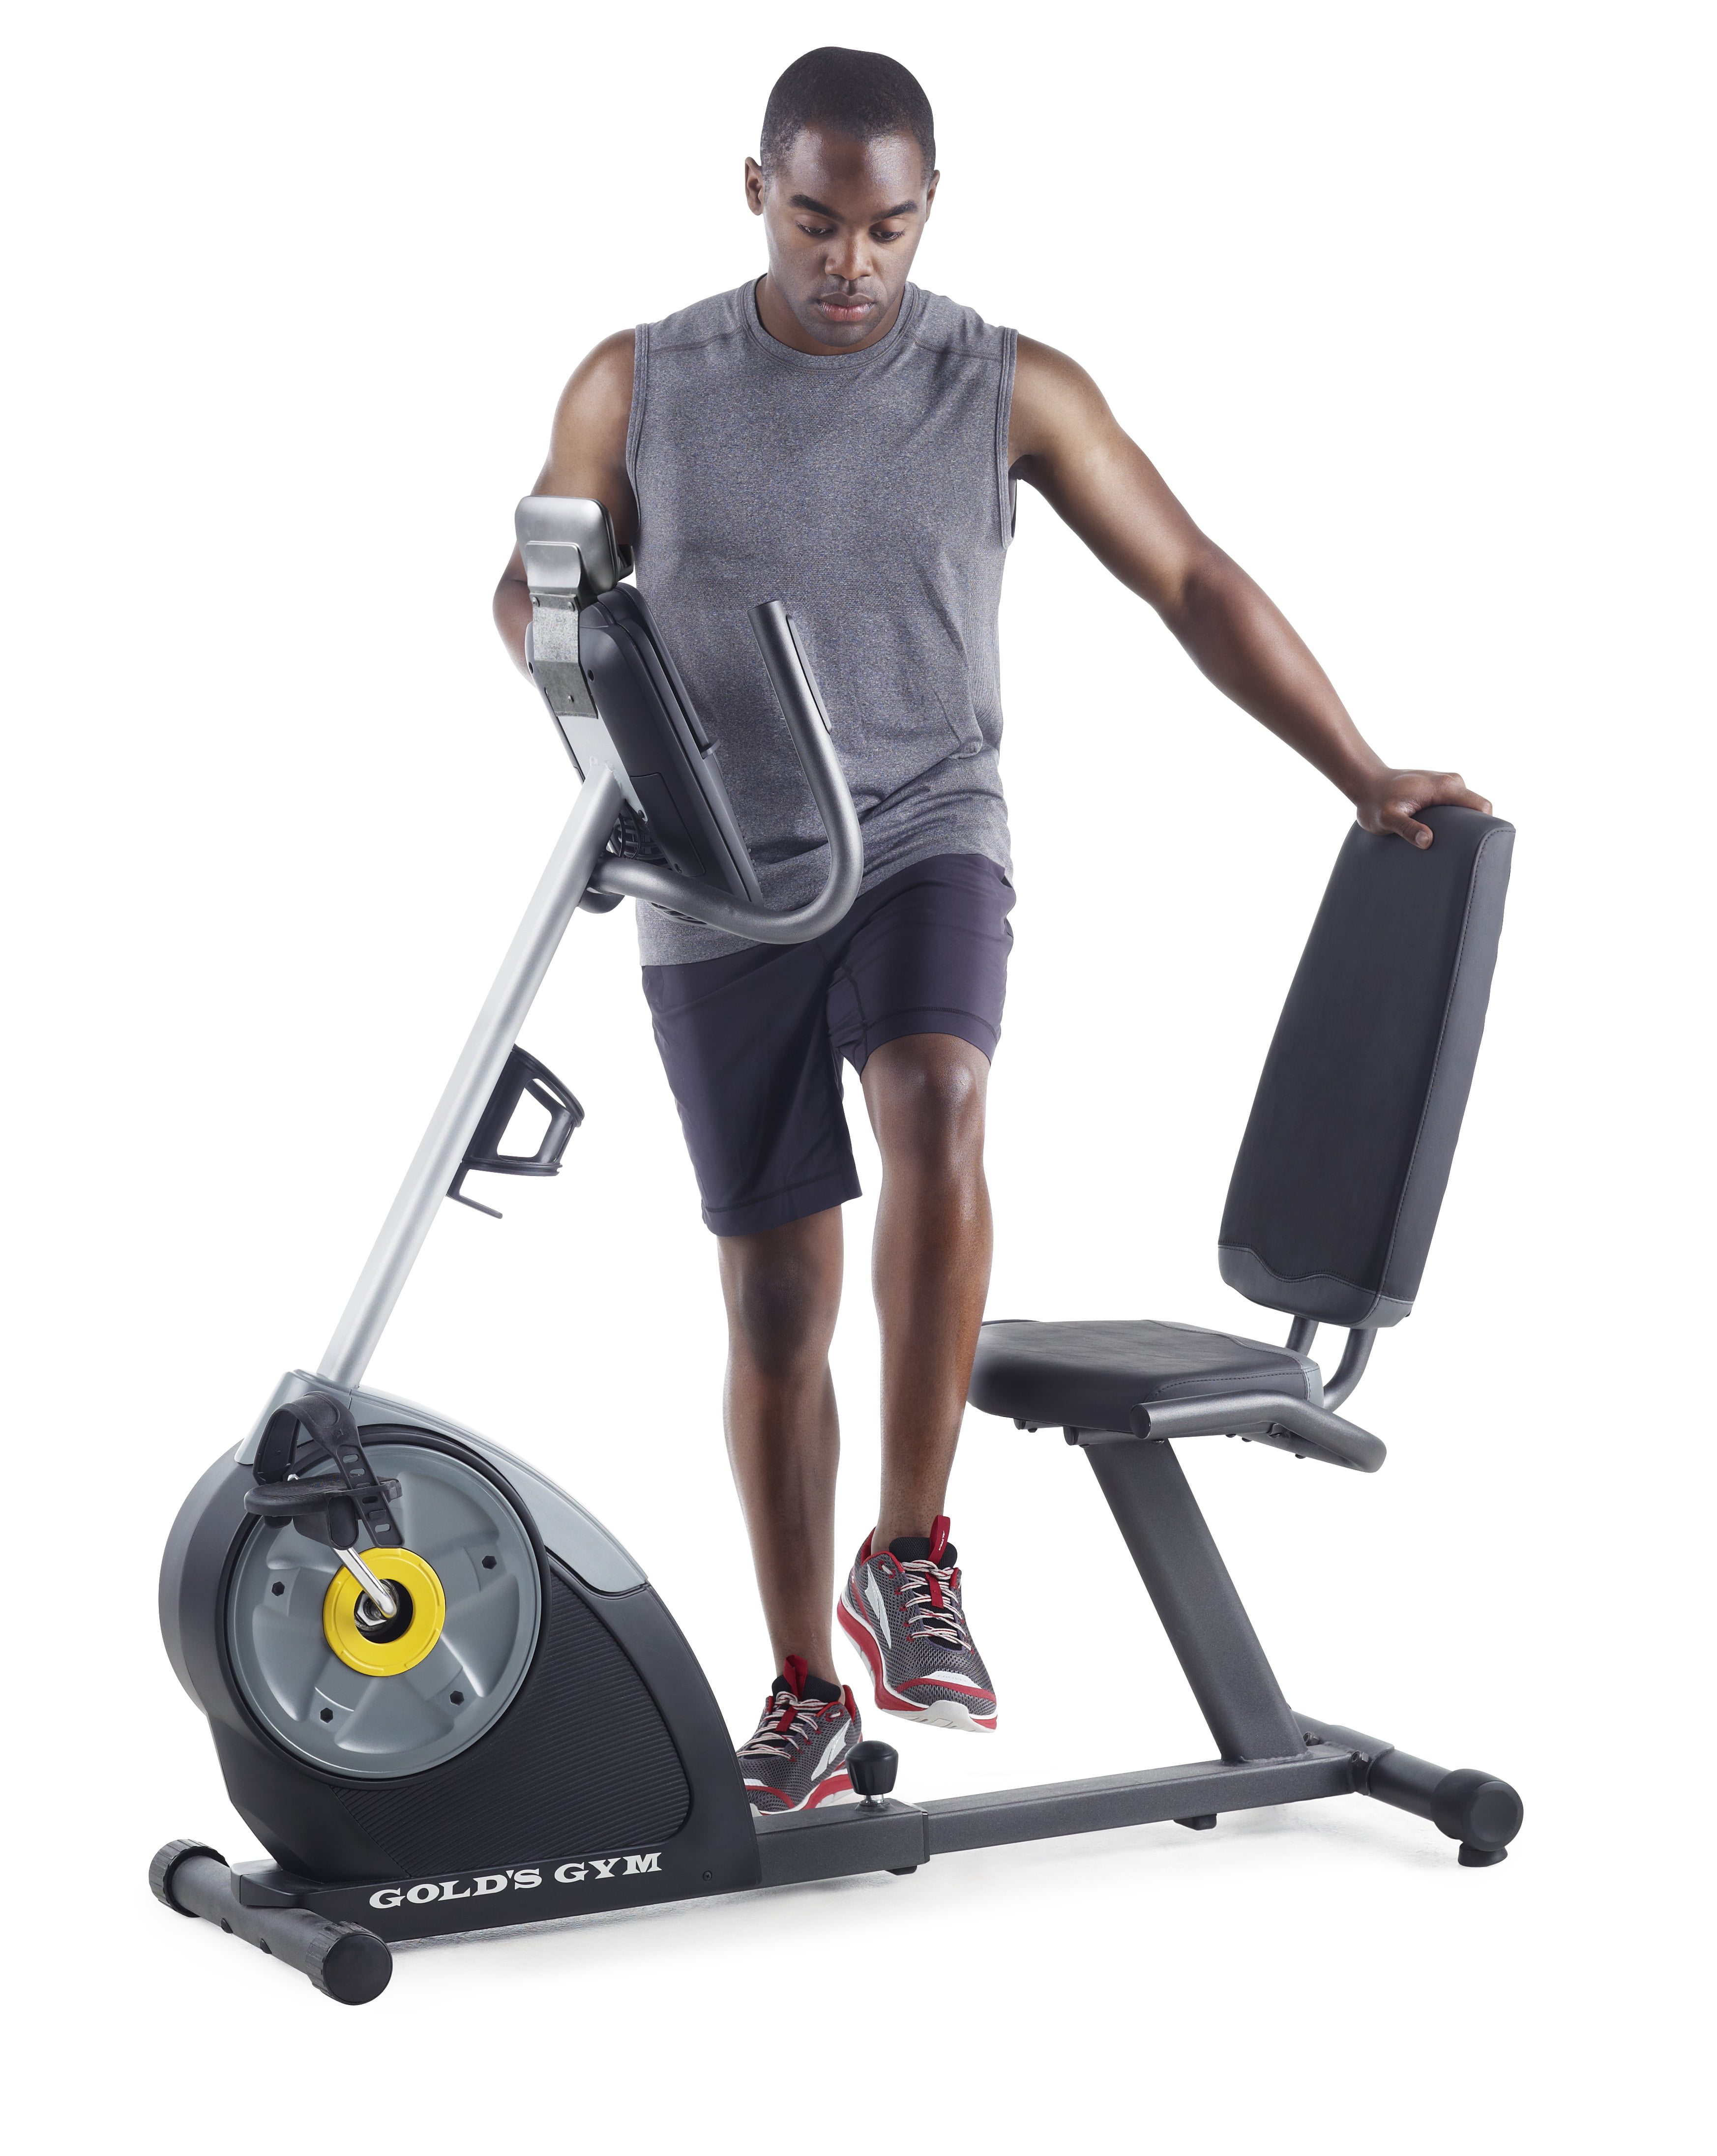 Gold%27s Gym Recumbent Bike 400 Ri User Manual